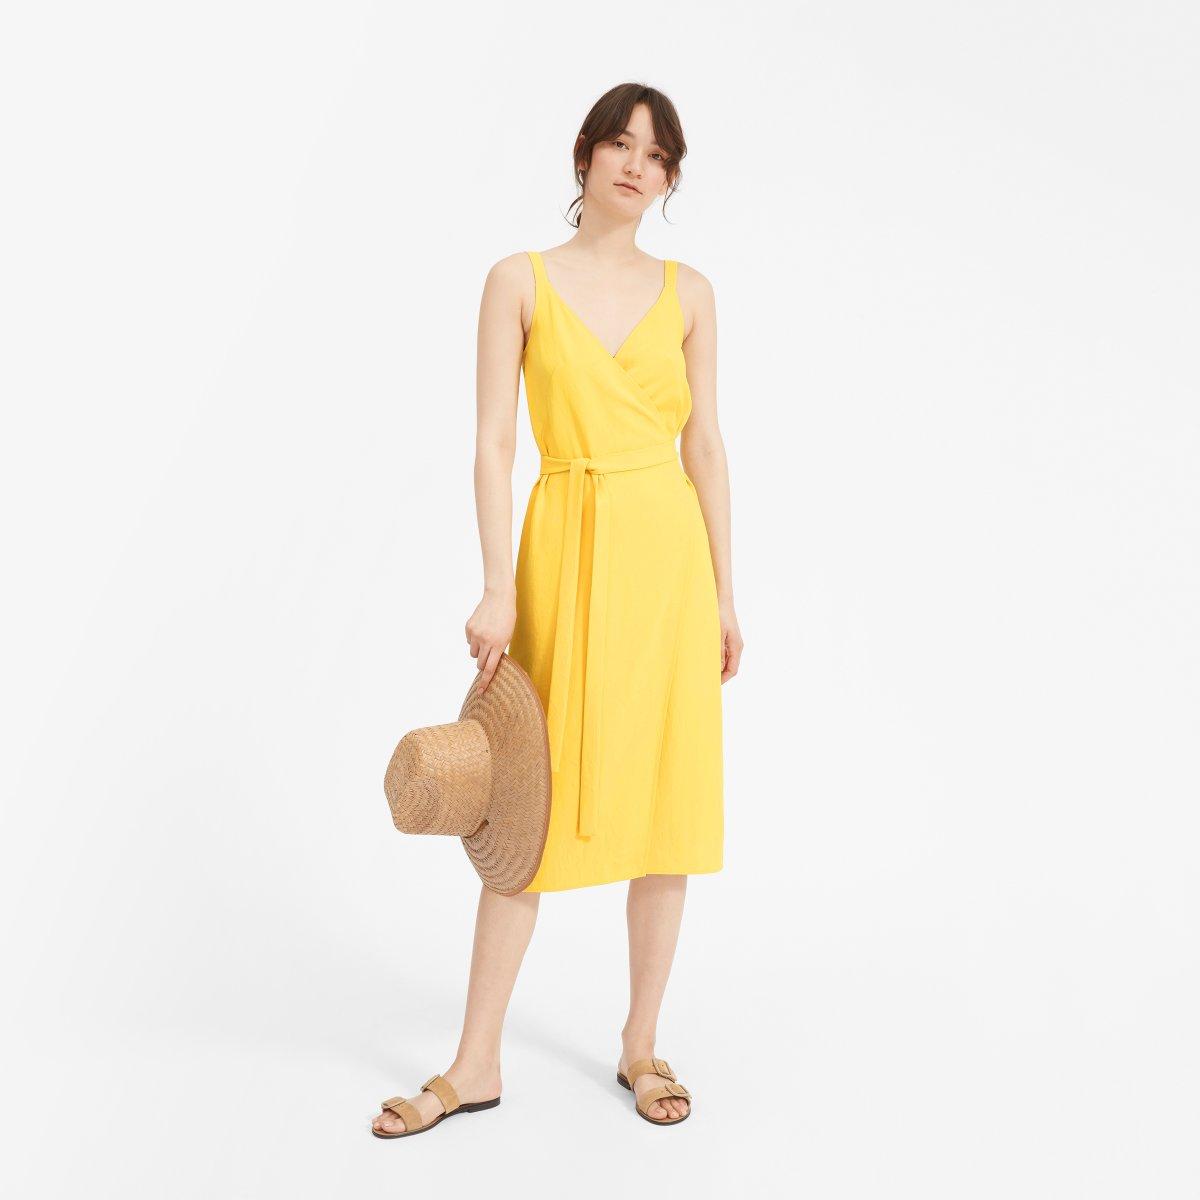 Everlane Dress, On Sale for $60!